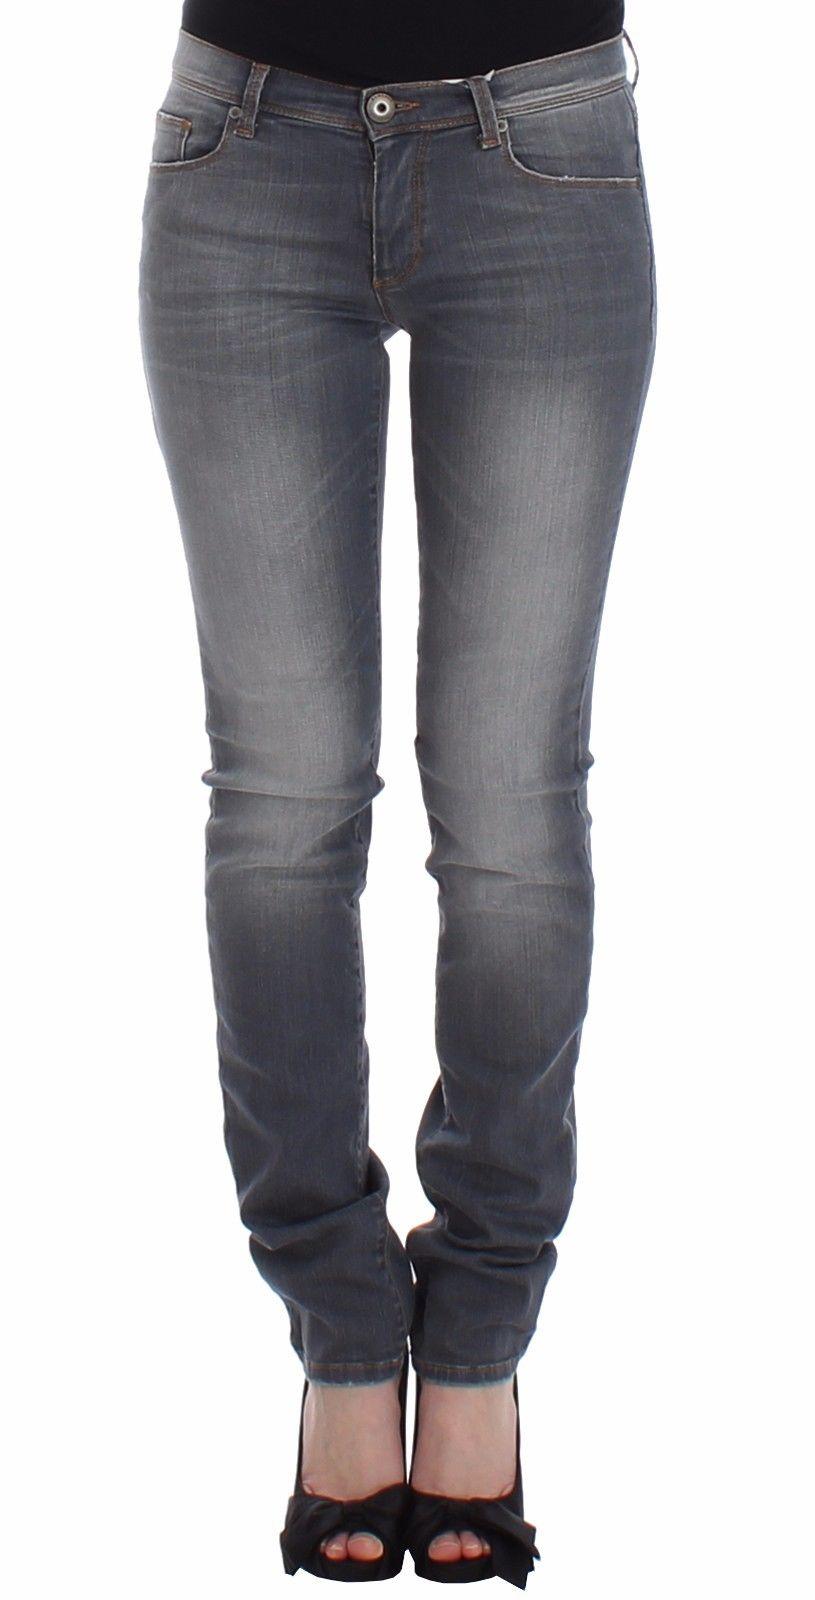 Ermanno Scervino Women's Slim Jeans Grey SIG12449 - W26